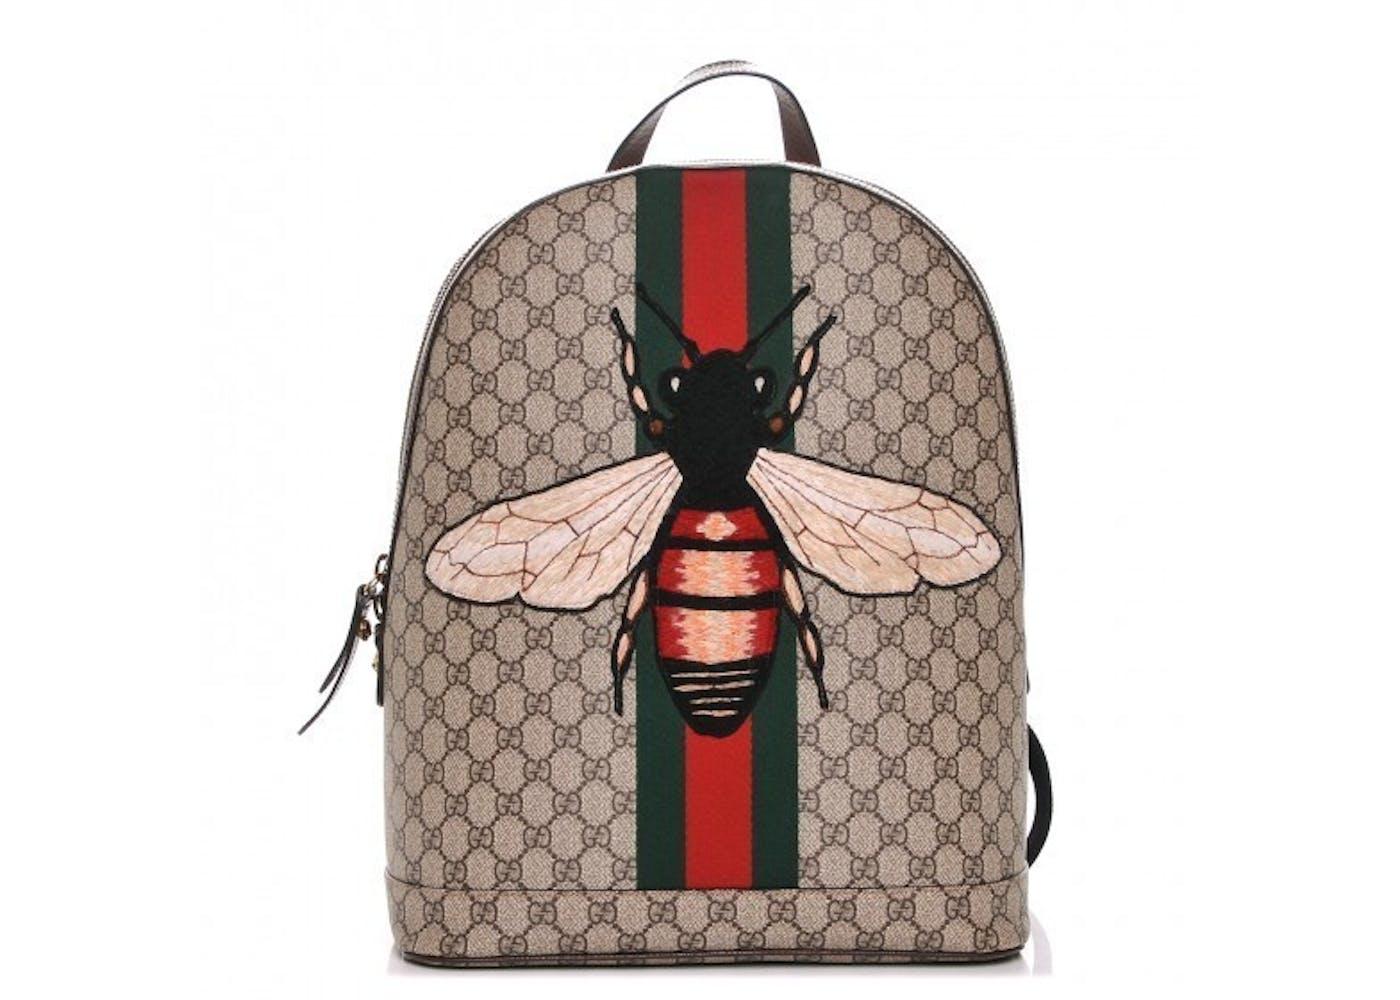 Gucci Animalier Web Backpack Monogram GG Supreme Stitched